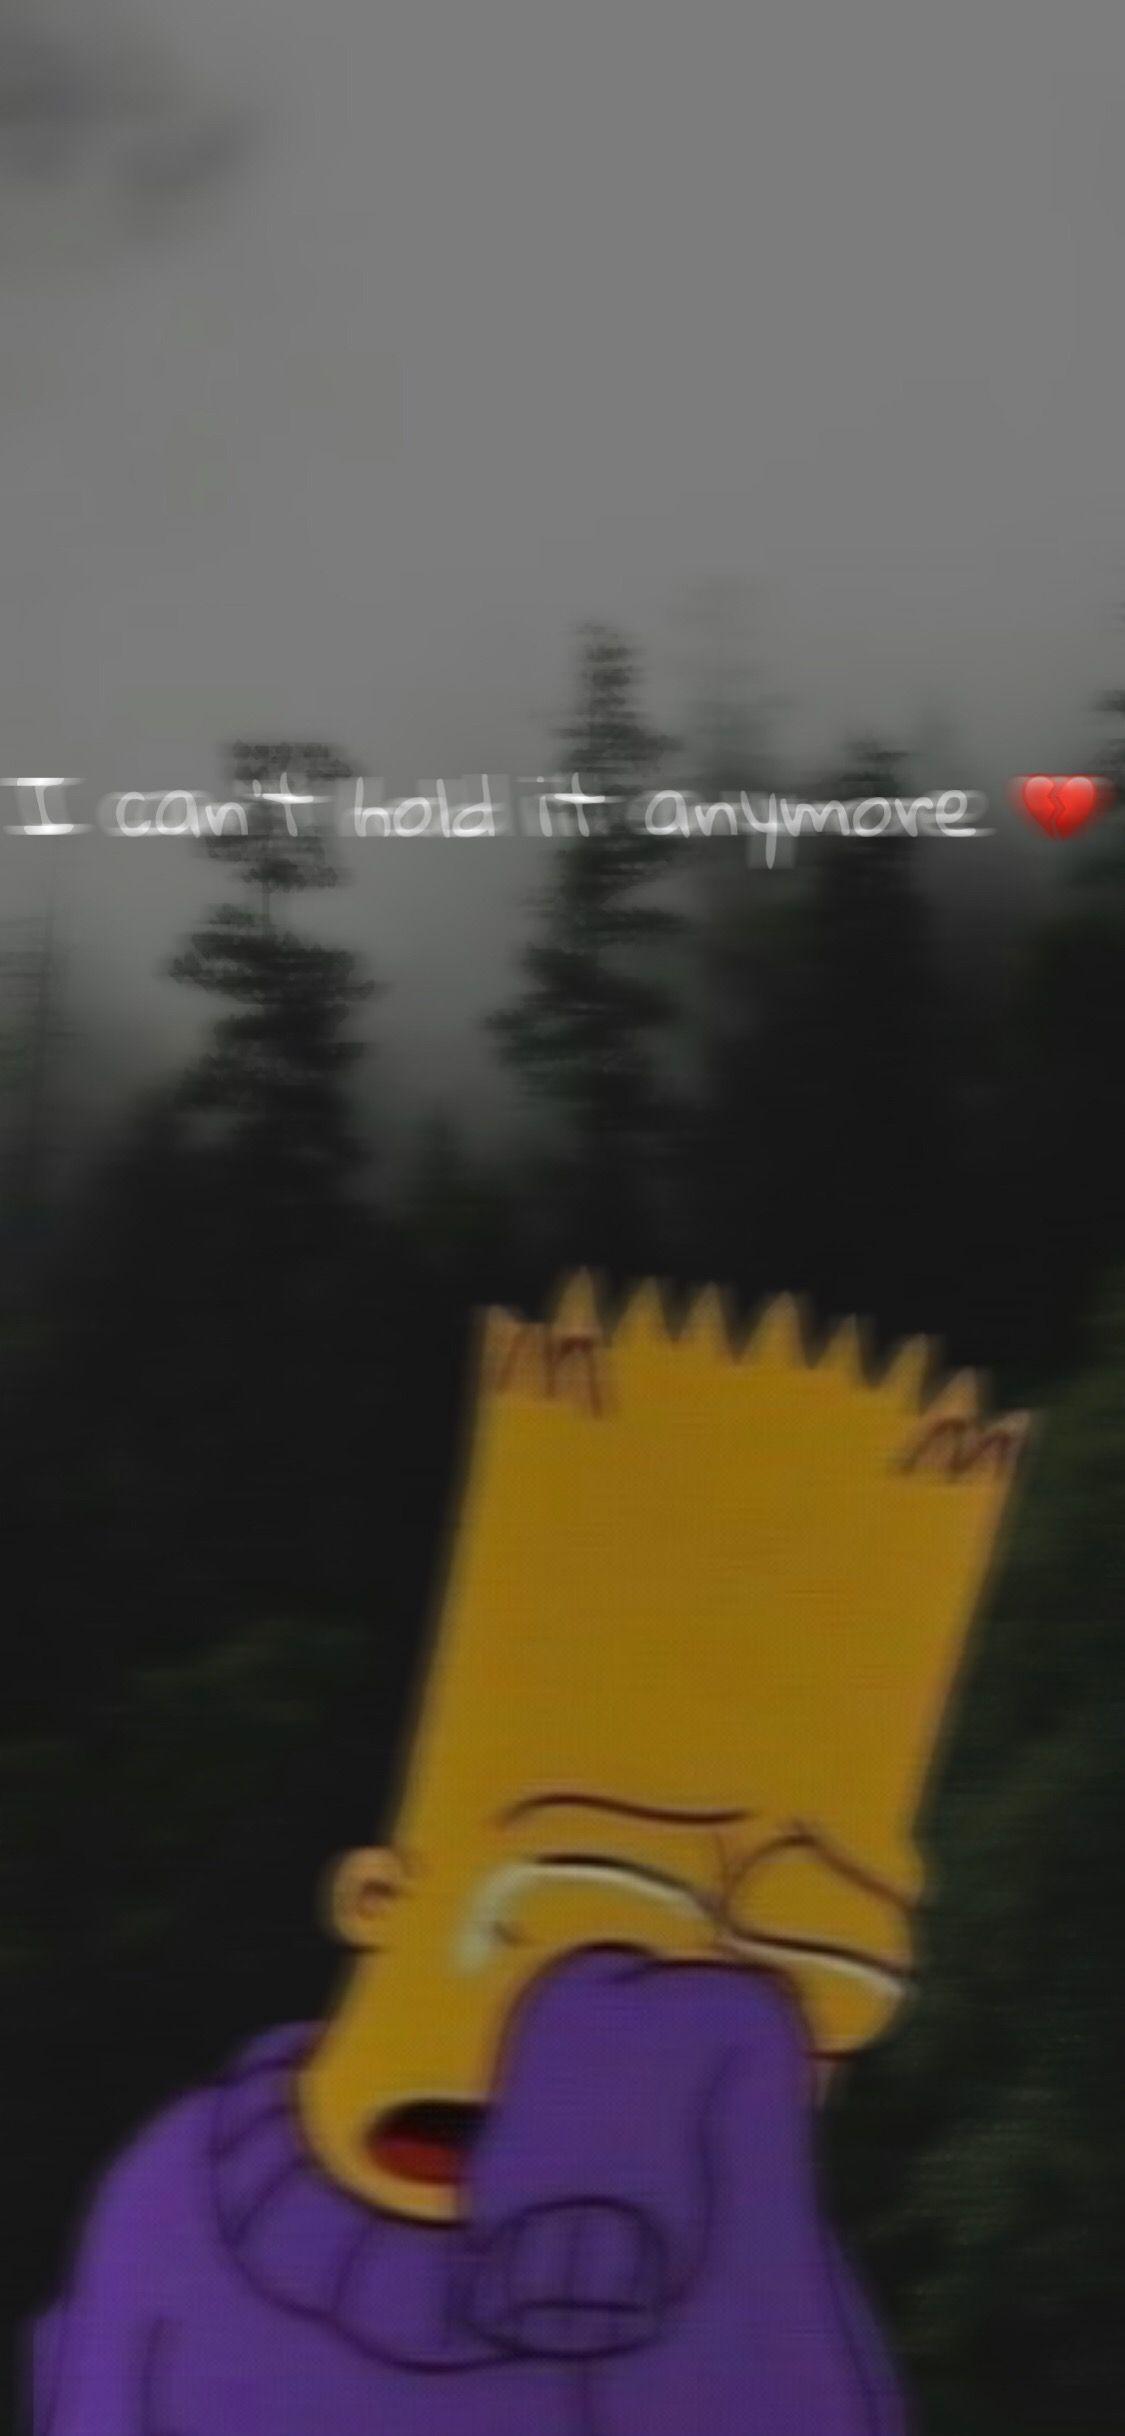 Depressed Bart Simpson HD iPhone Wallpapers - Wallpaper Cave